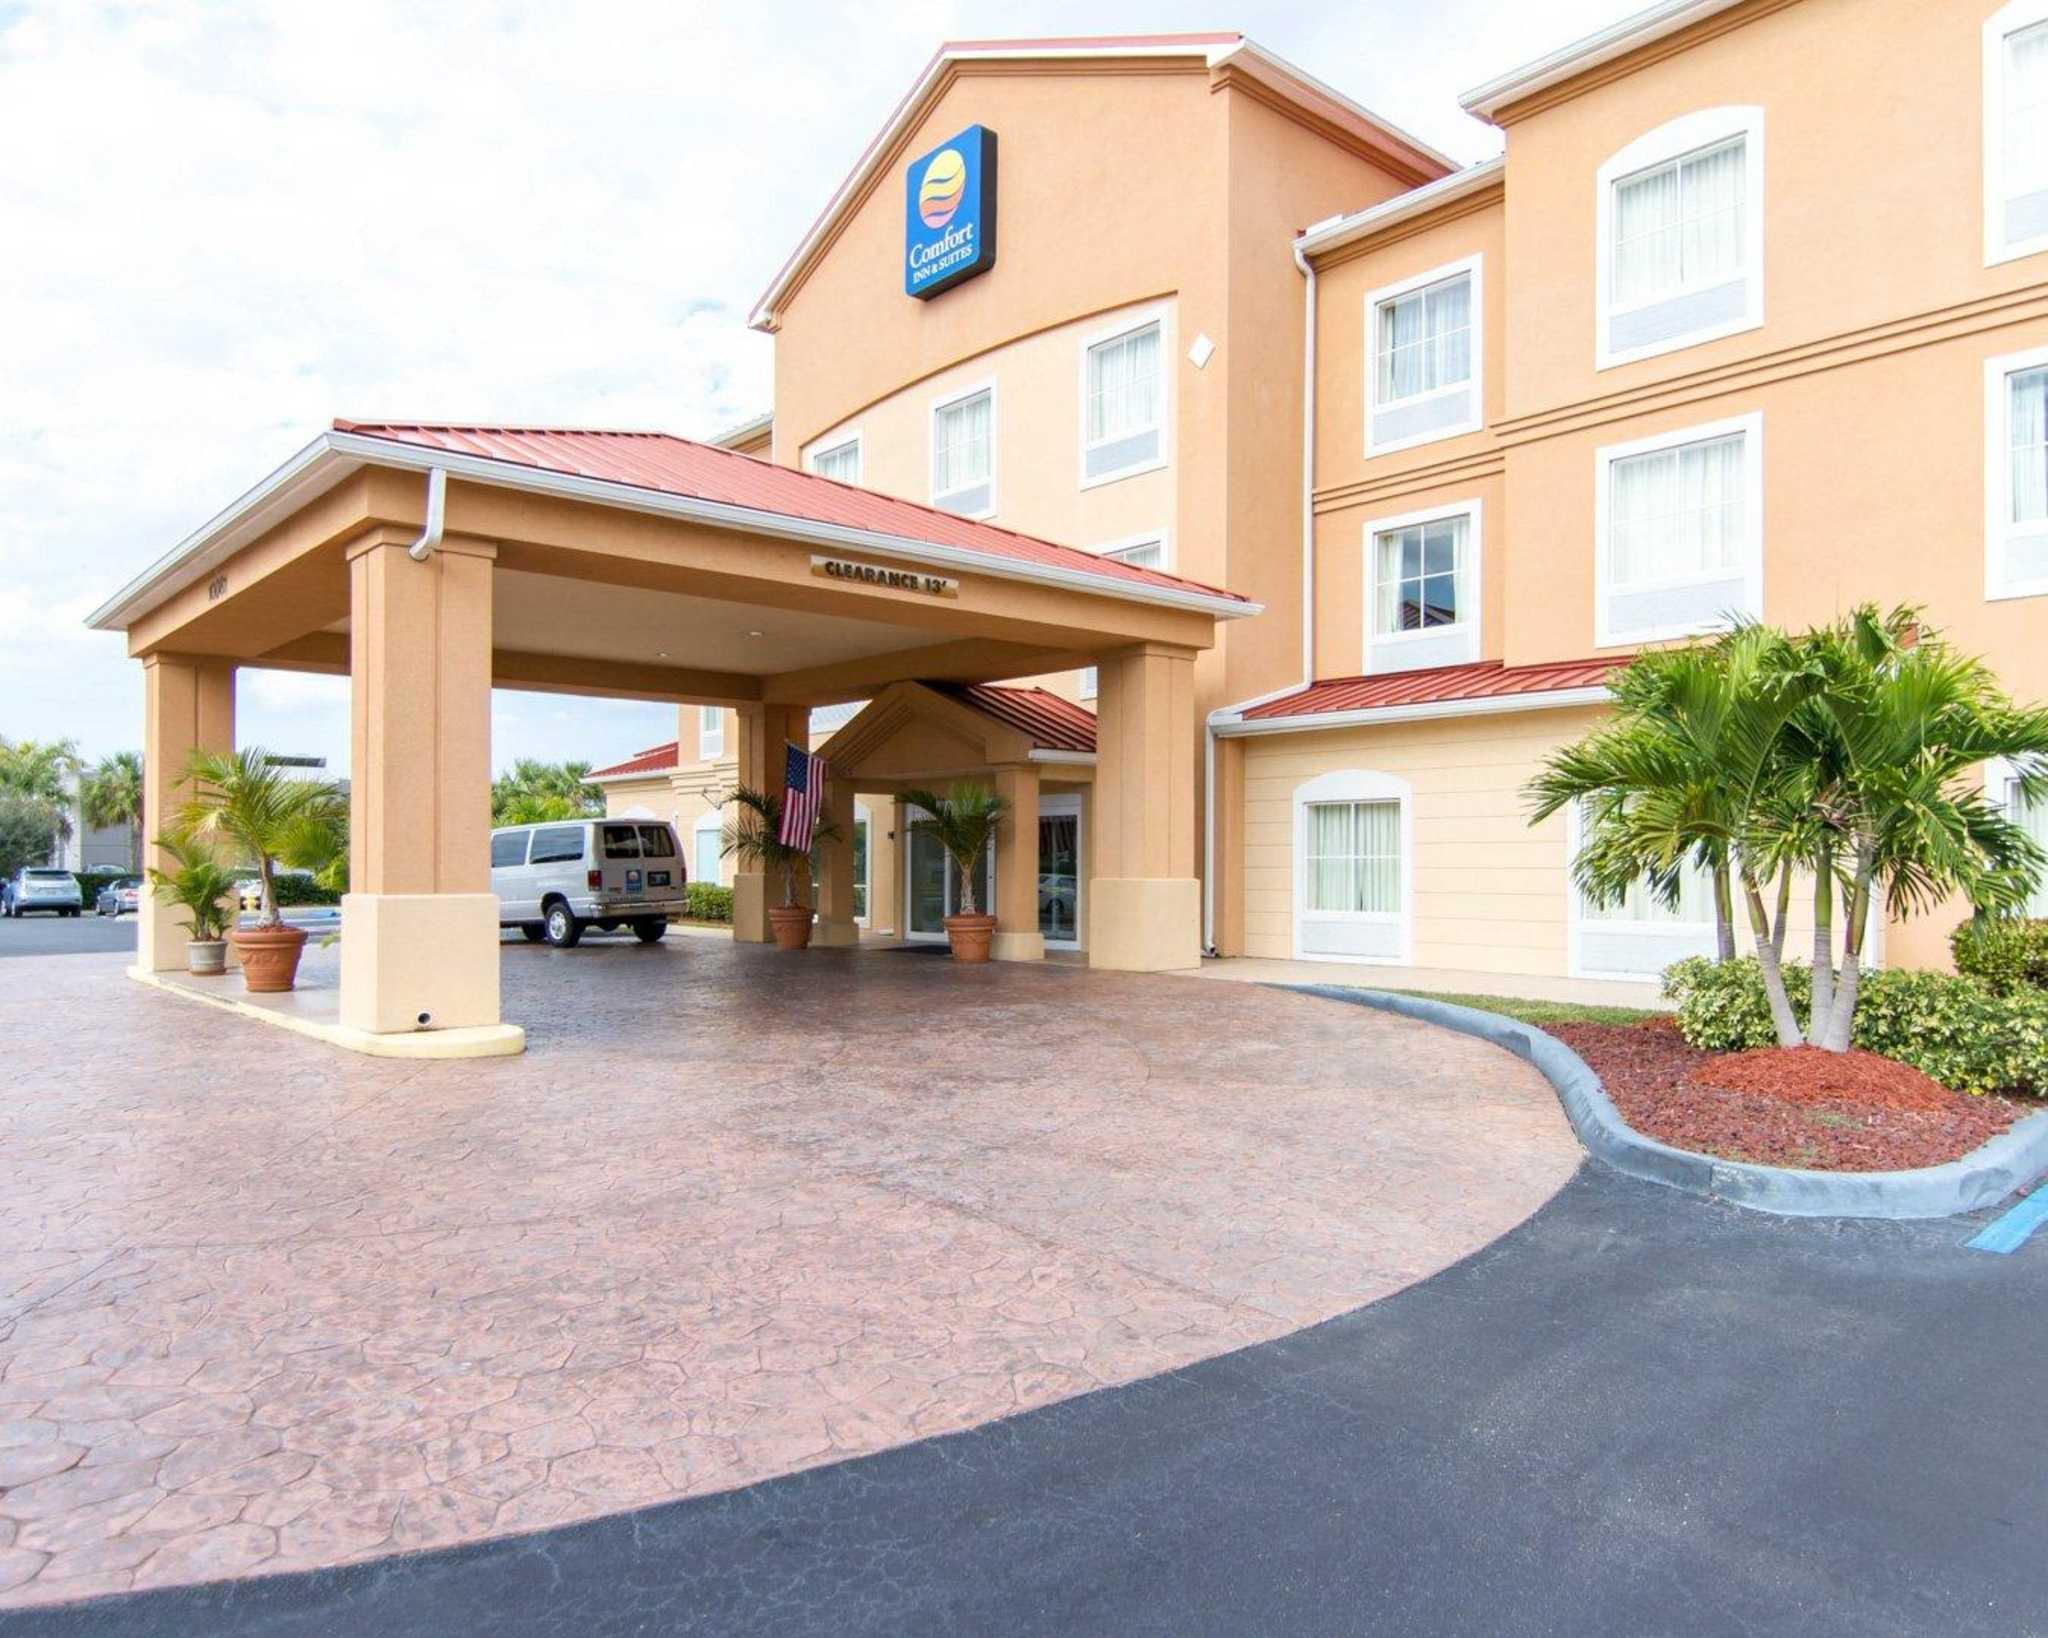 Comfort Inn & Suites Airport image 2